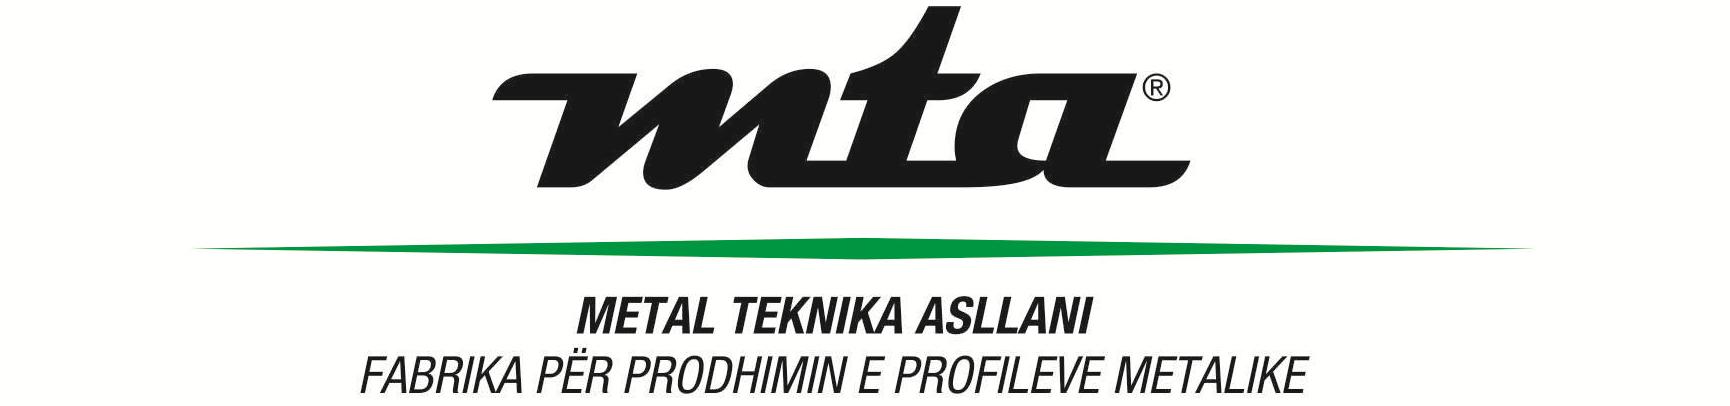 Metal Teknika Asllani Logo